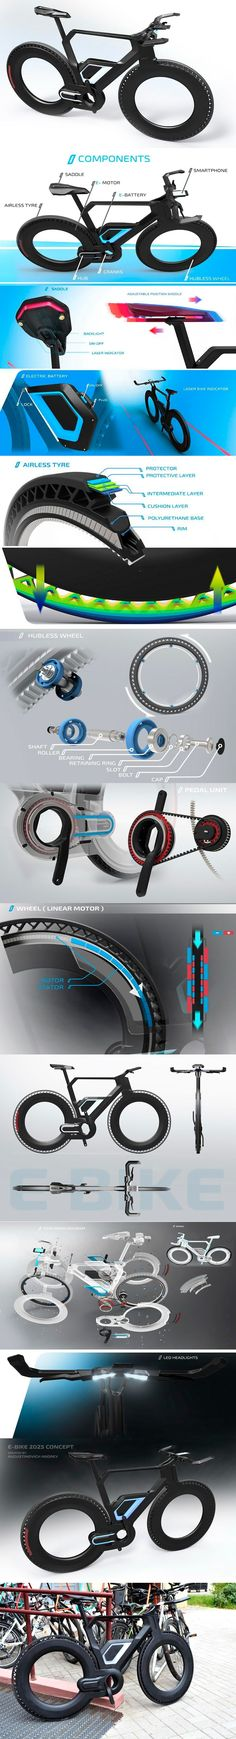 The electric bike designer: Avgustinovich Andrey